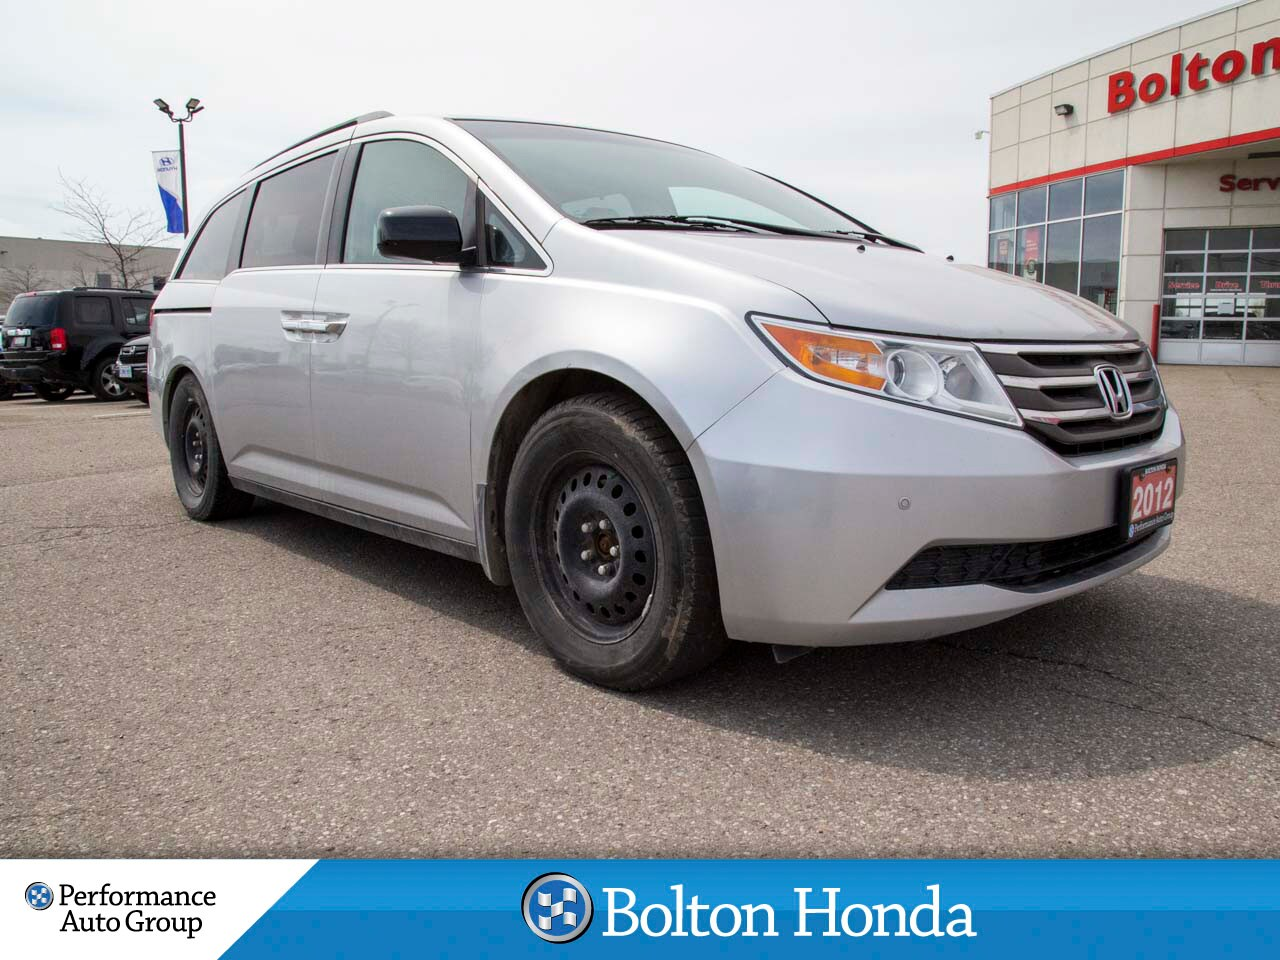 2012 Honda Odyssey For Sale >> Used 2012 Honda Odyssey For Sale At Bolton Honda Vin